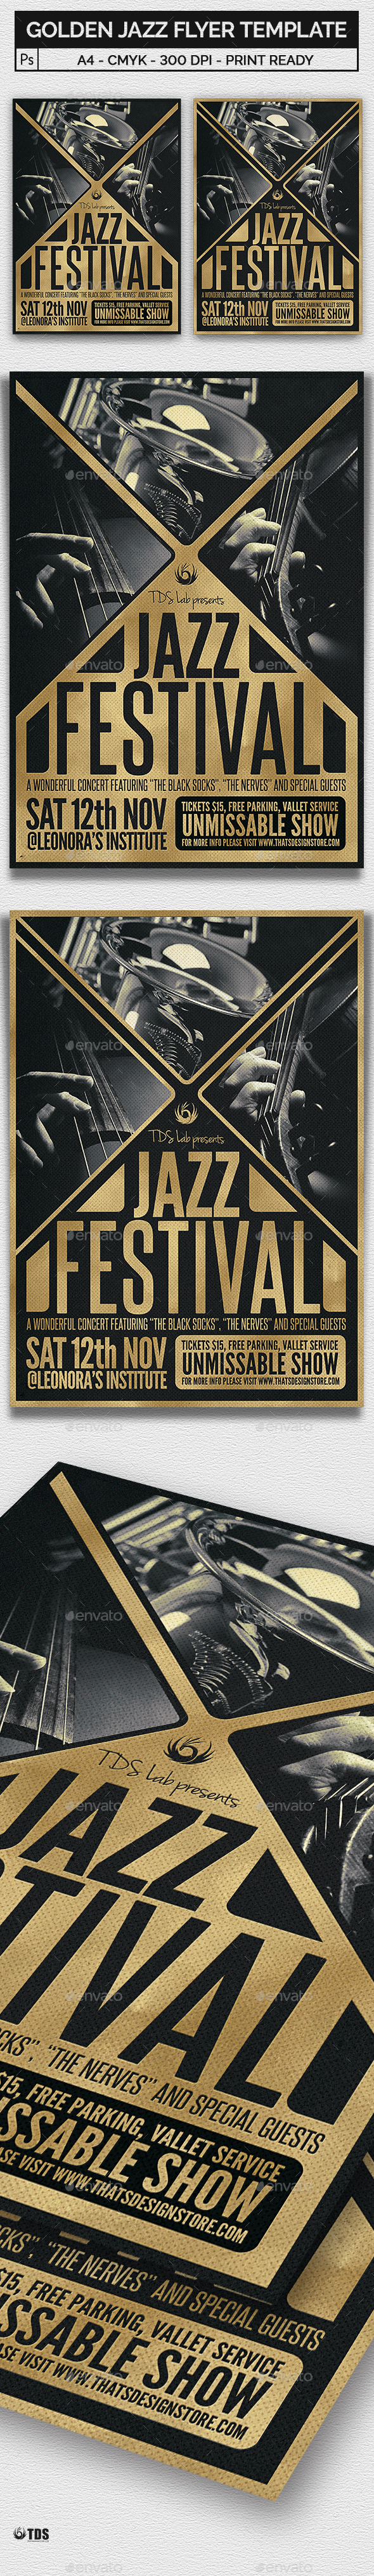 Golden Jazz Flyer Template - Concerts Events